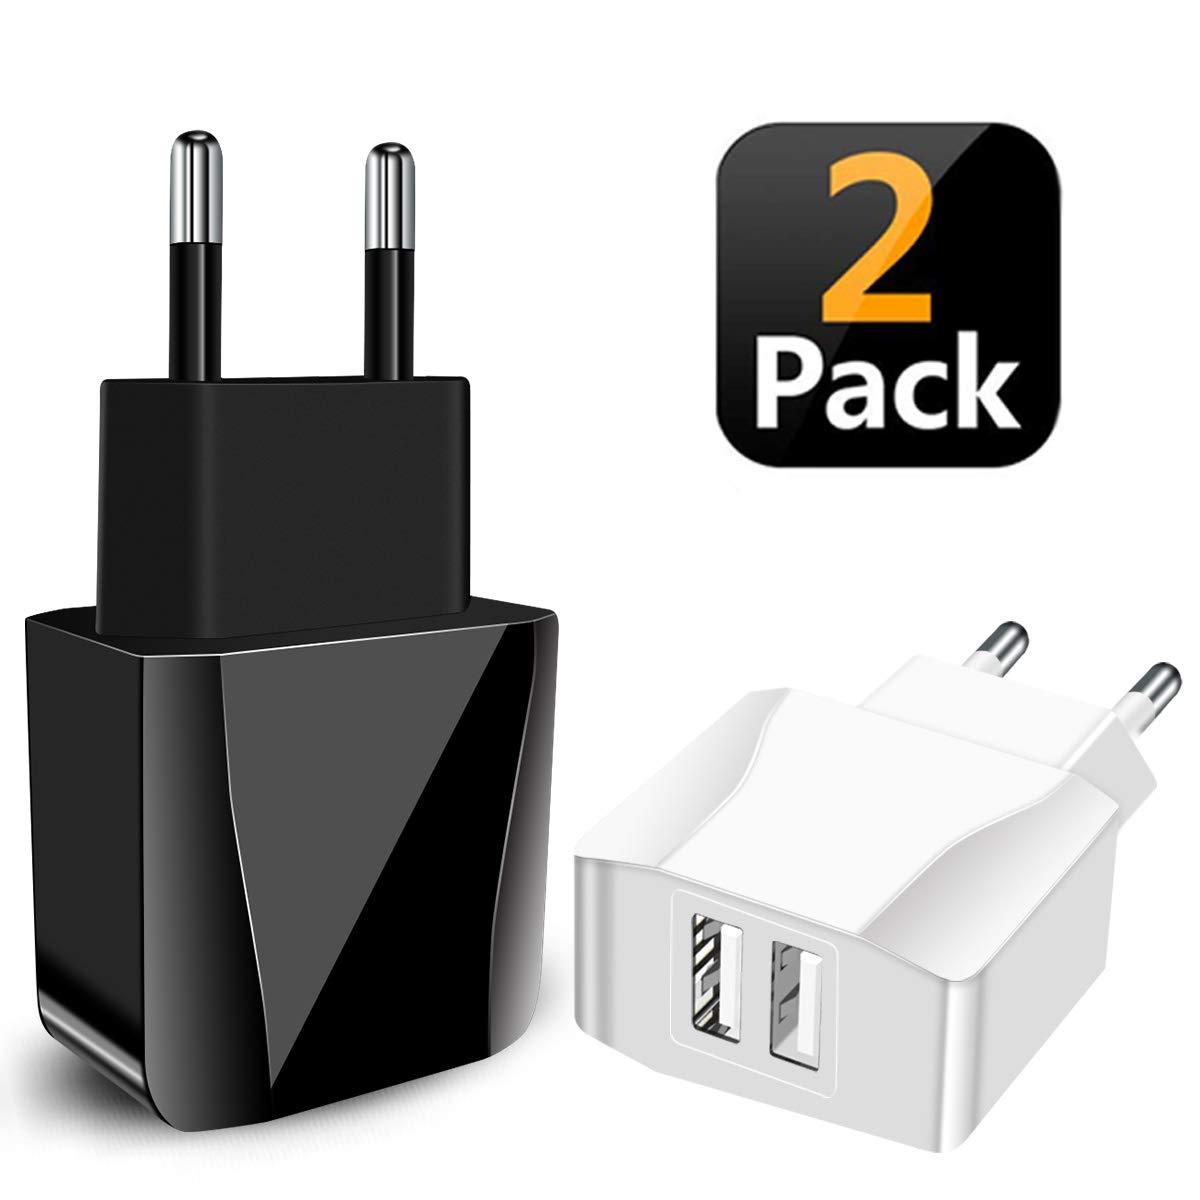 IceFrog USB Ladegerät USB Stecker 2 Pack 2-Port Netzteil 5V, Ladeadapter Adapter